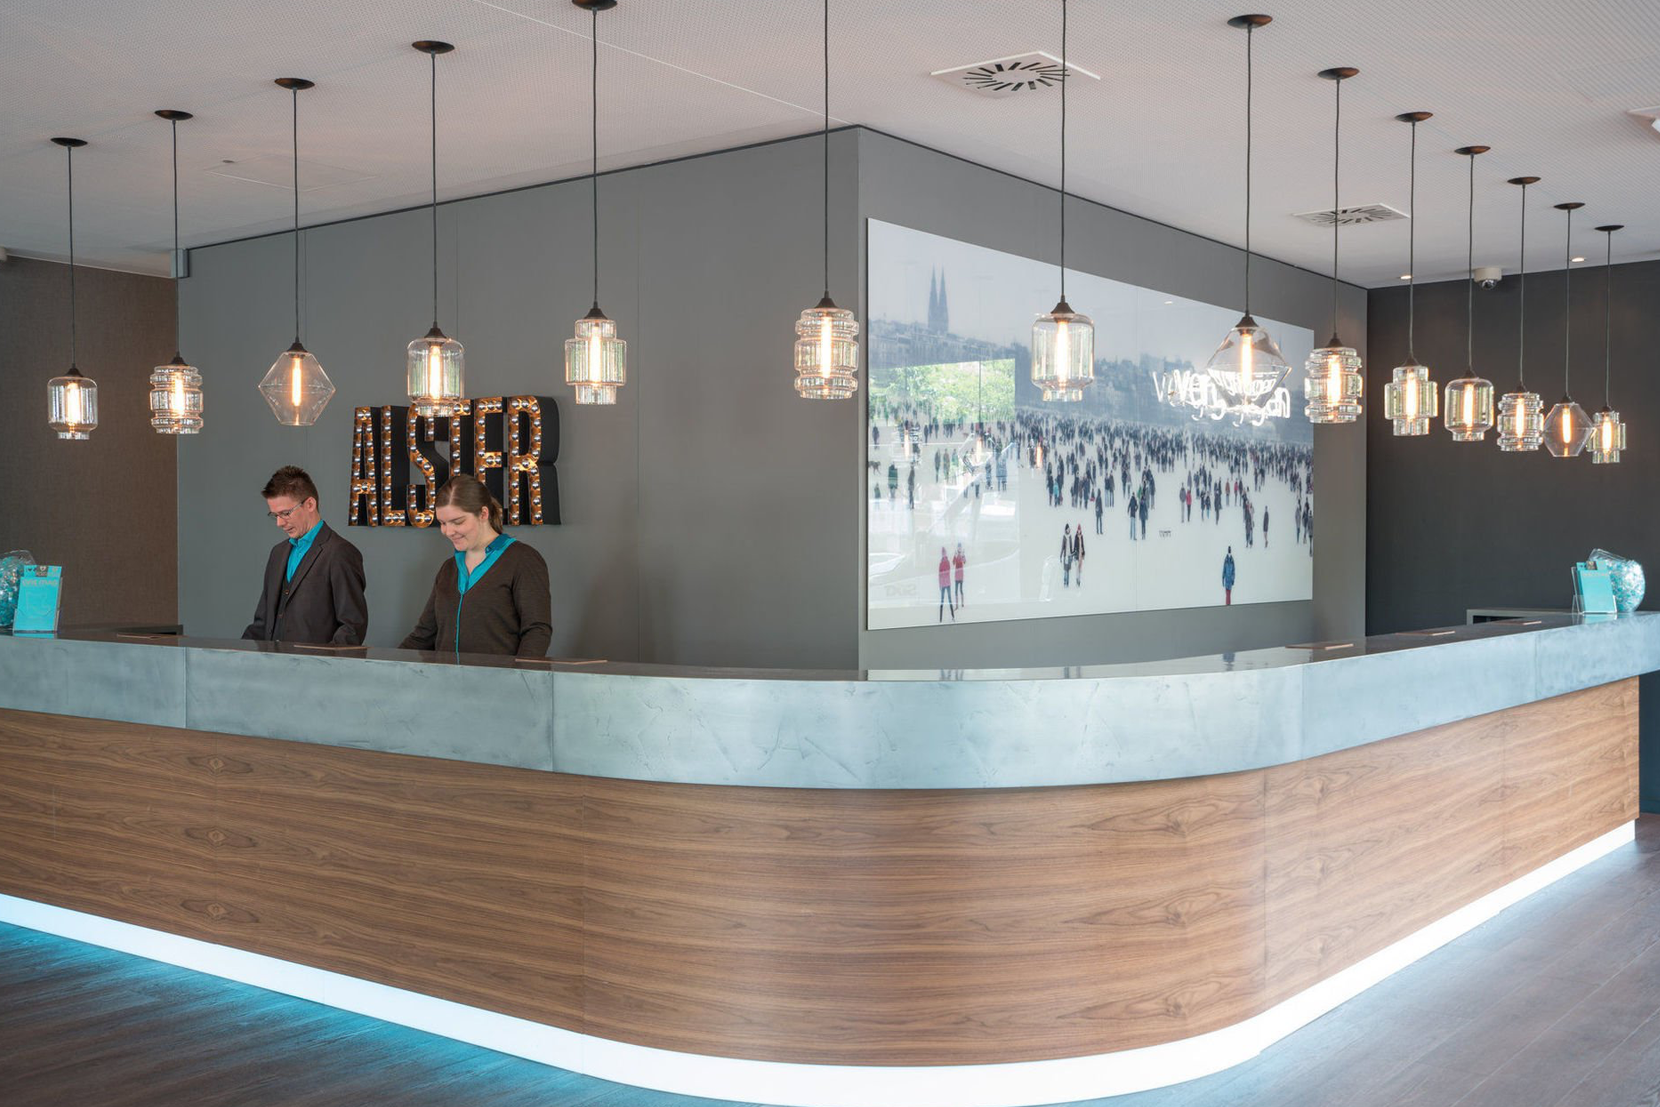 Modern-motel-Lighting-Lobby-Front-Desk-Germany.png